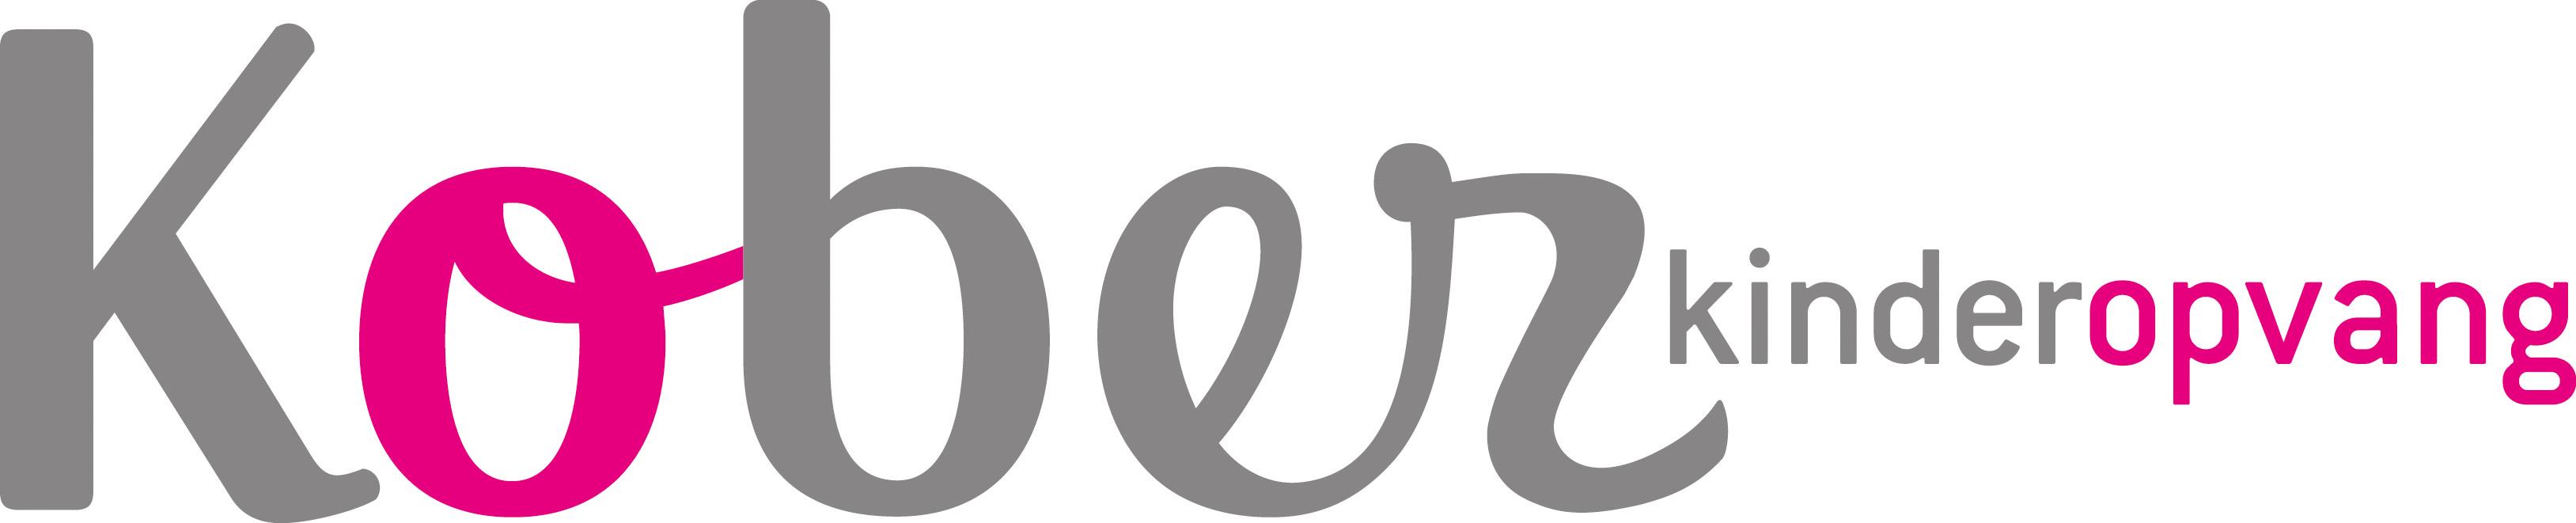 logo-kober-nieuw